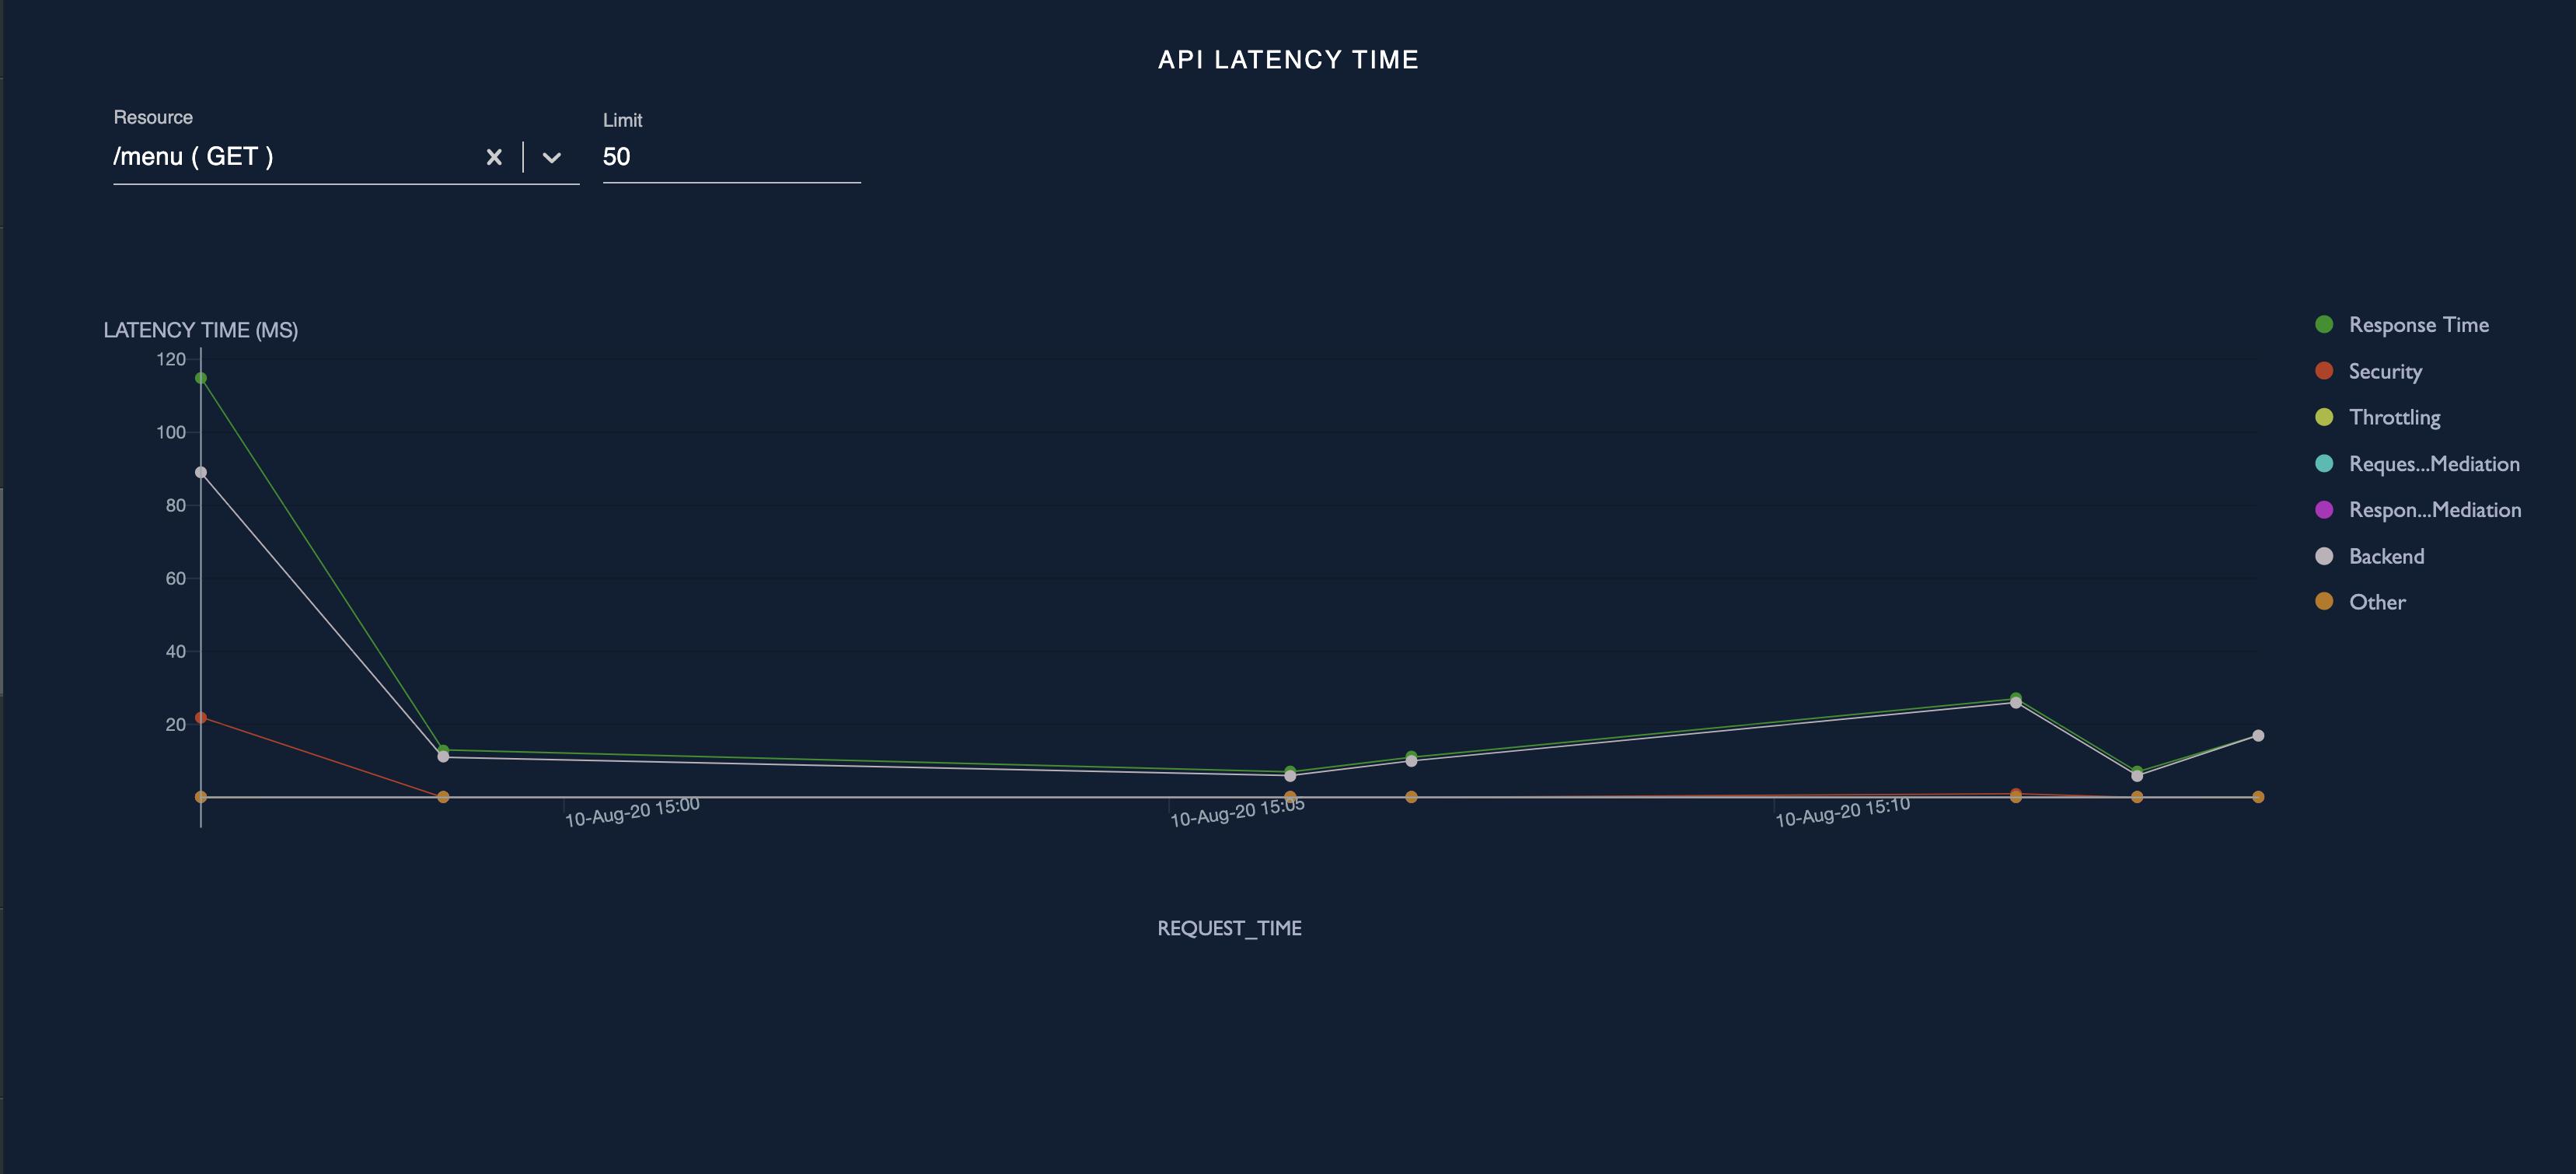 API latency time